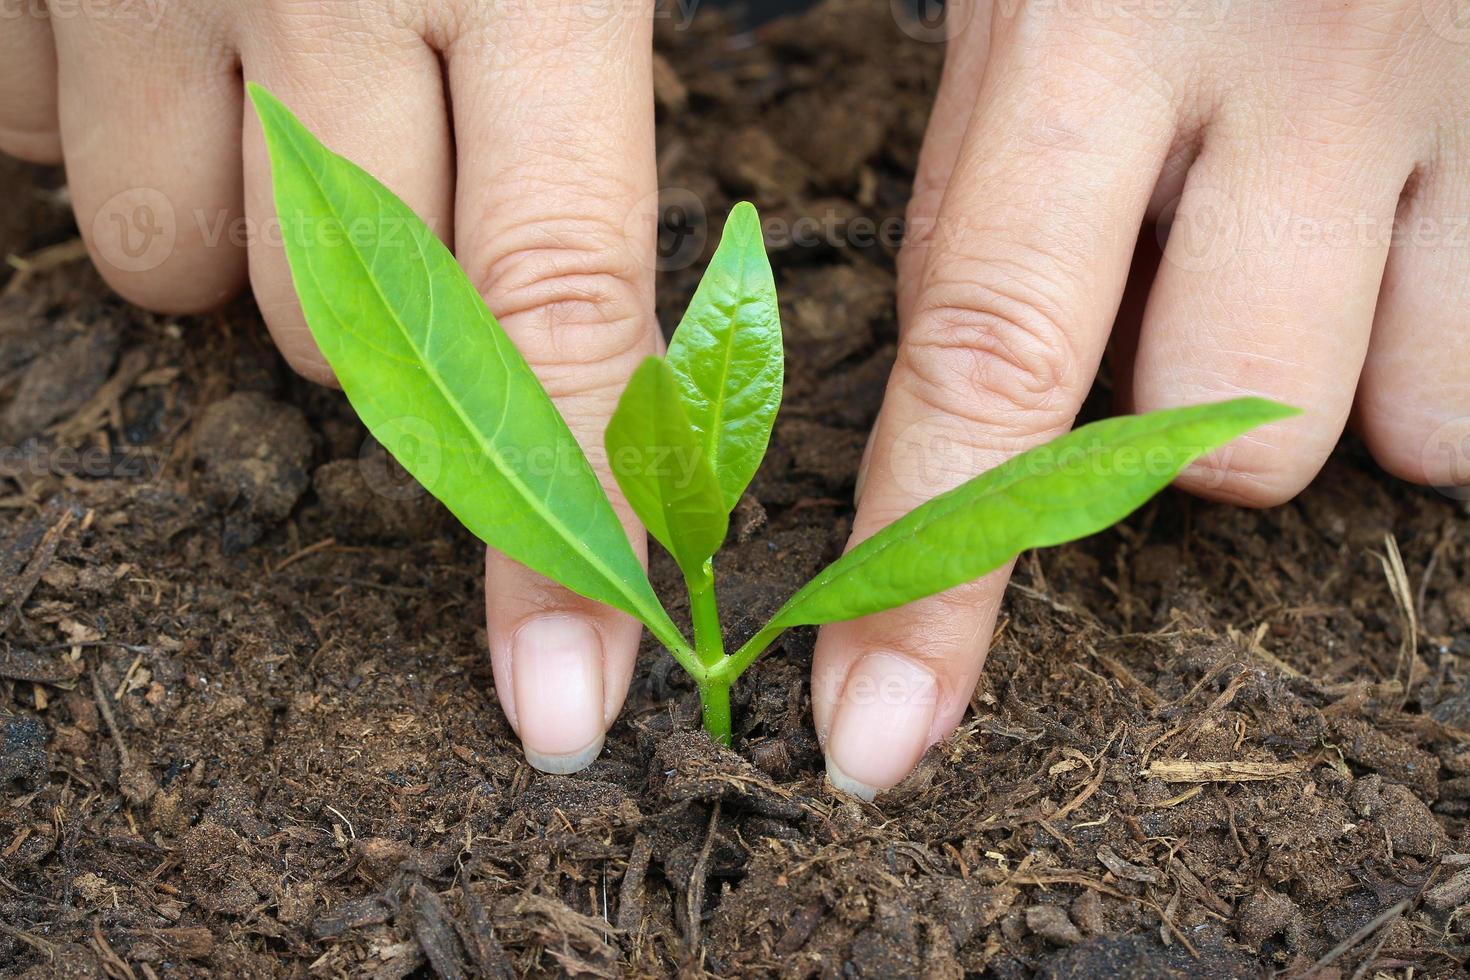 mulheres para plantar árvores. fechar-se. foto